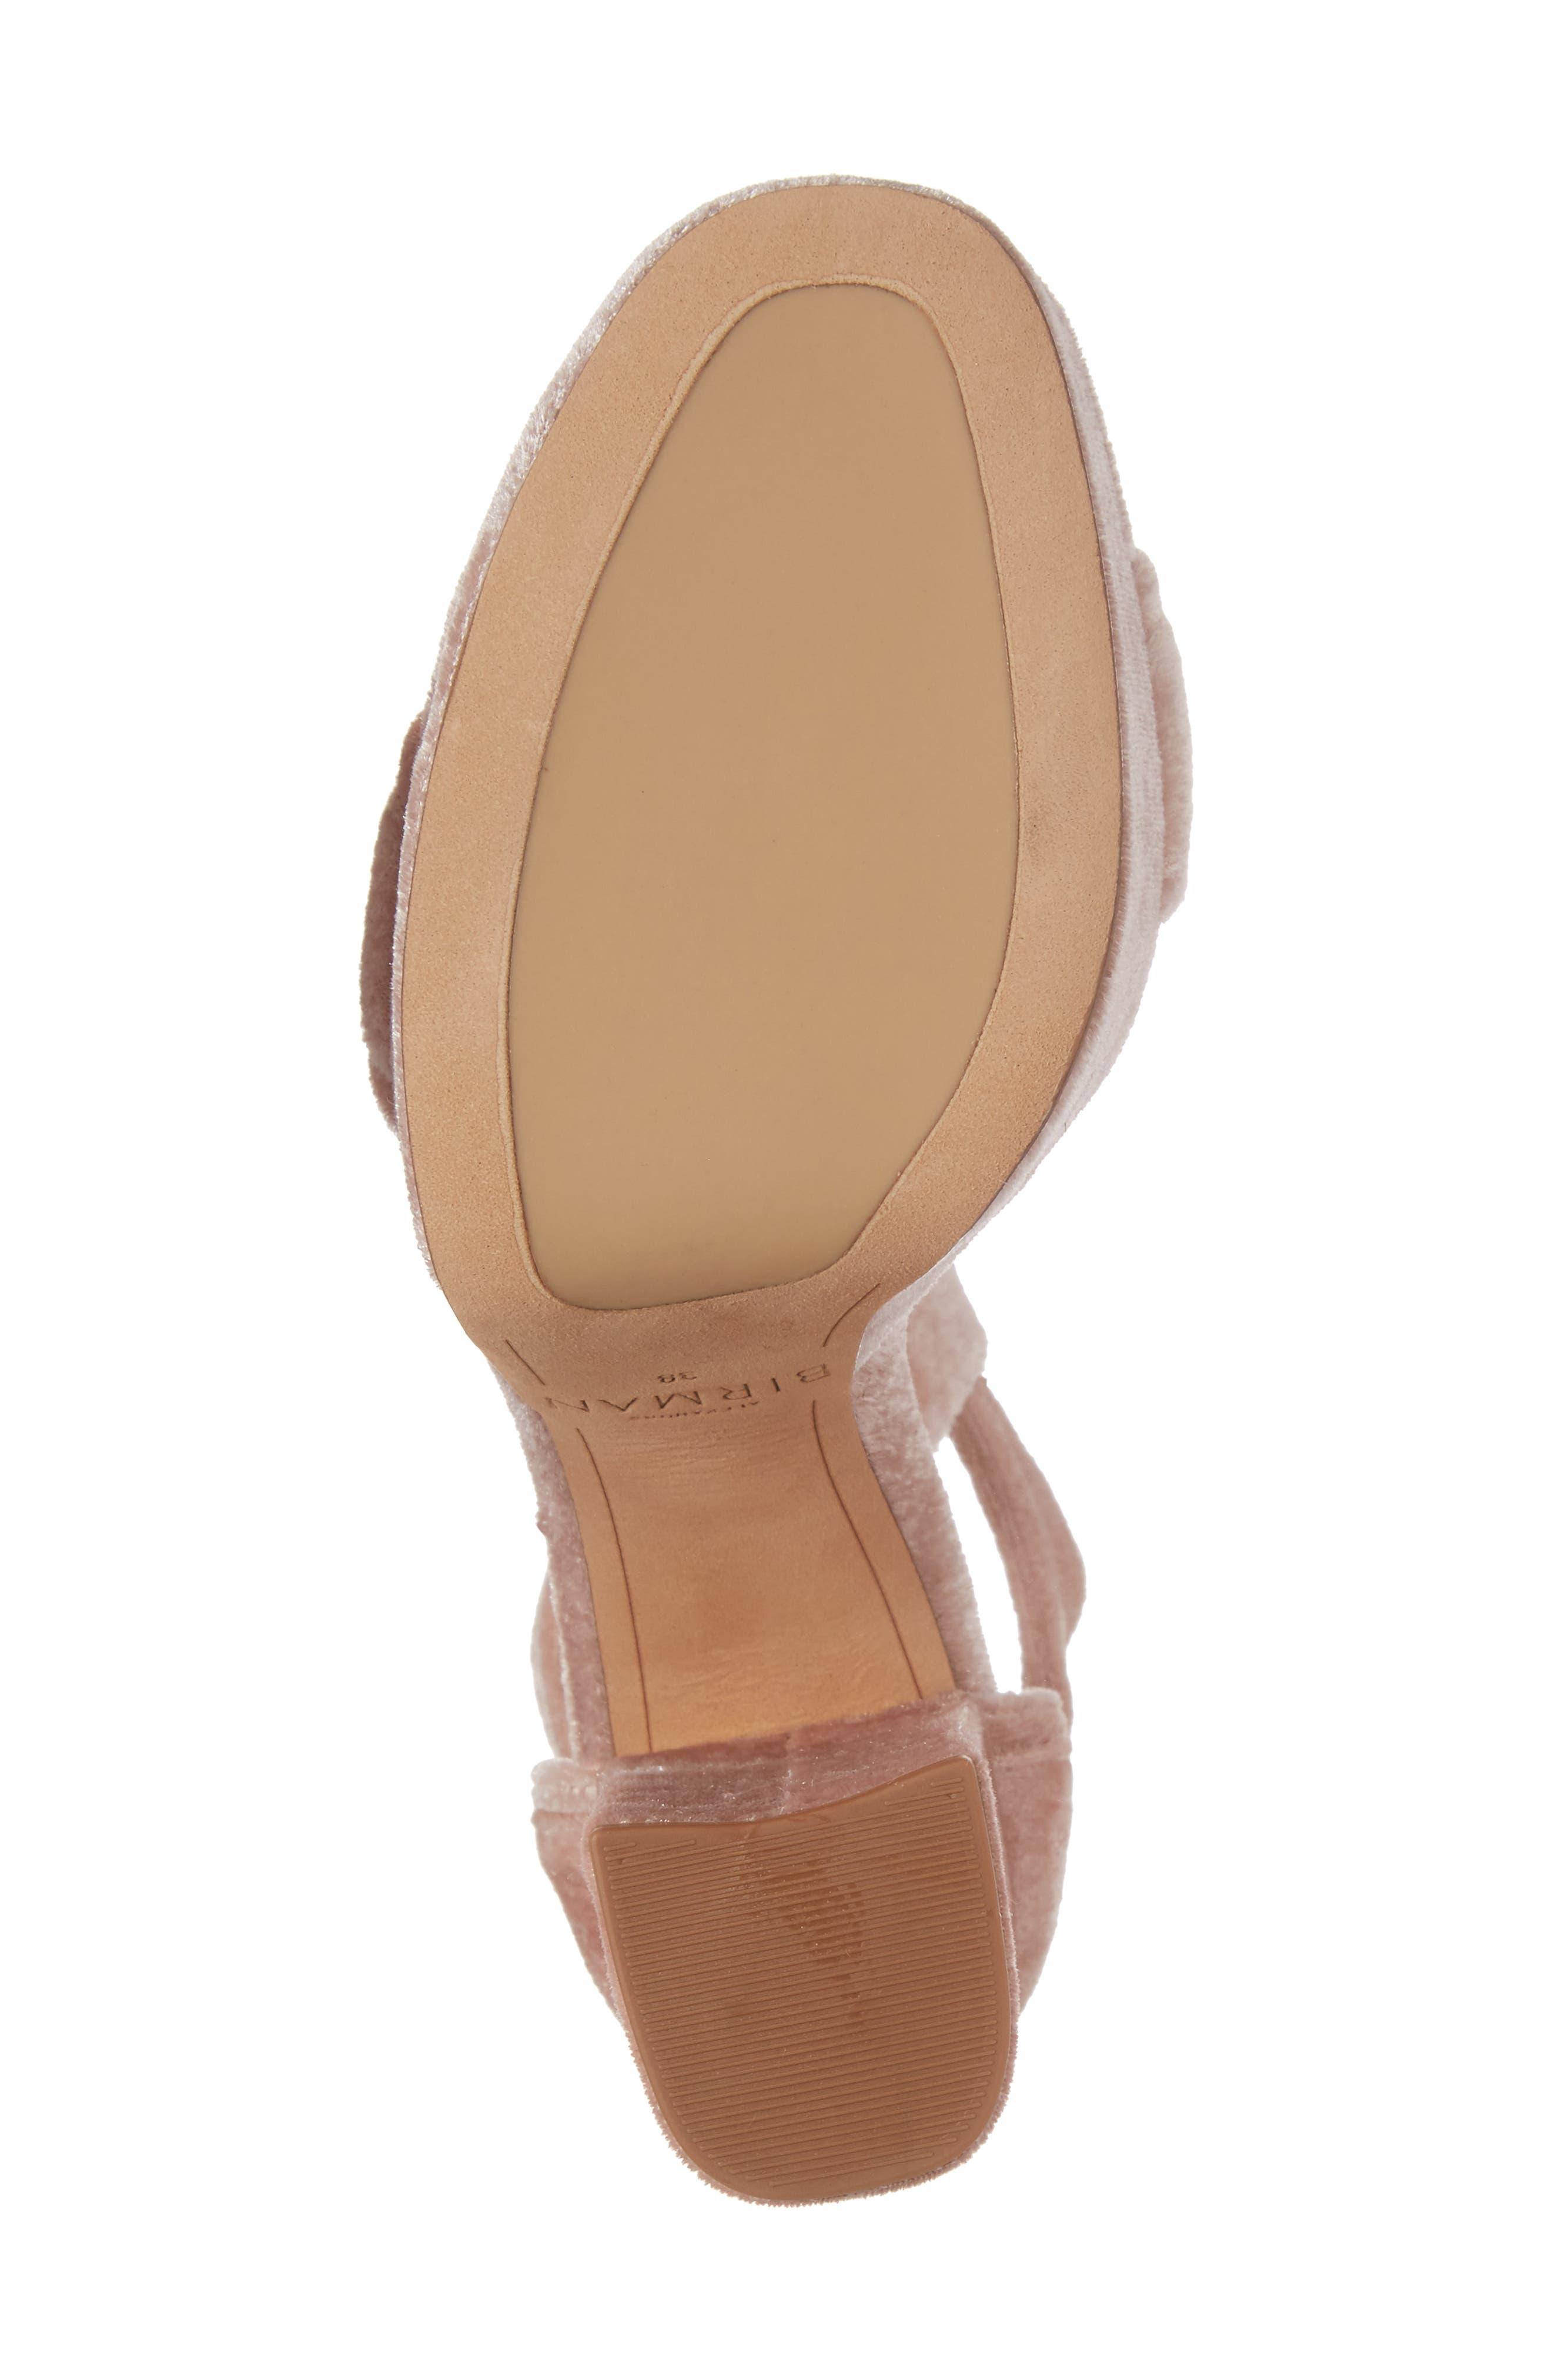 Celine Platform Sandal,                             Alternate thumbnail 12, color,